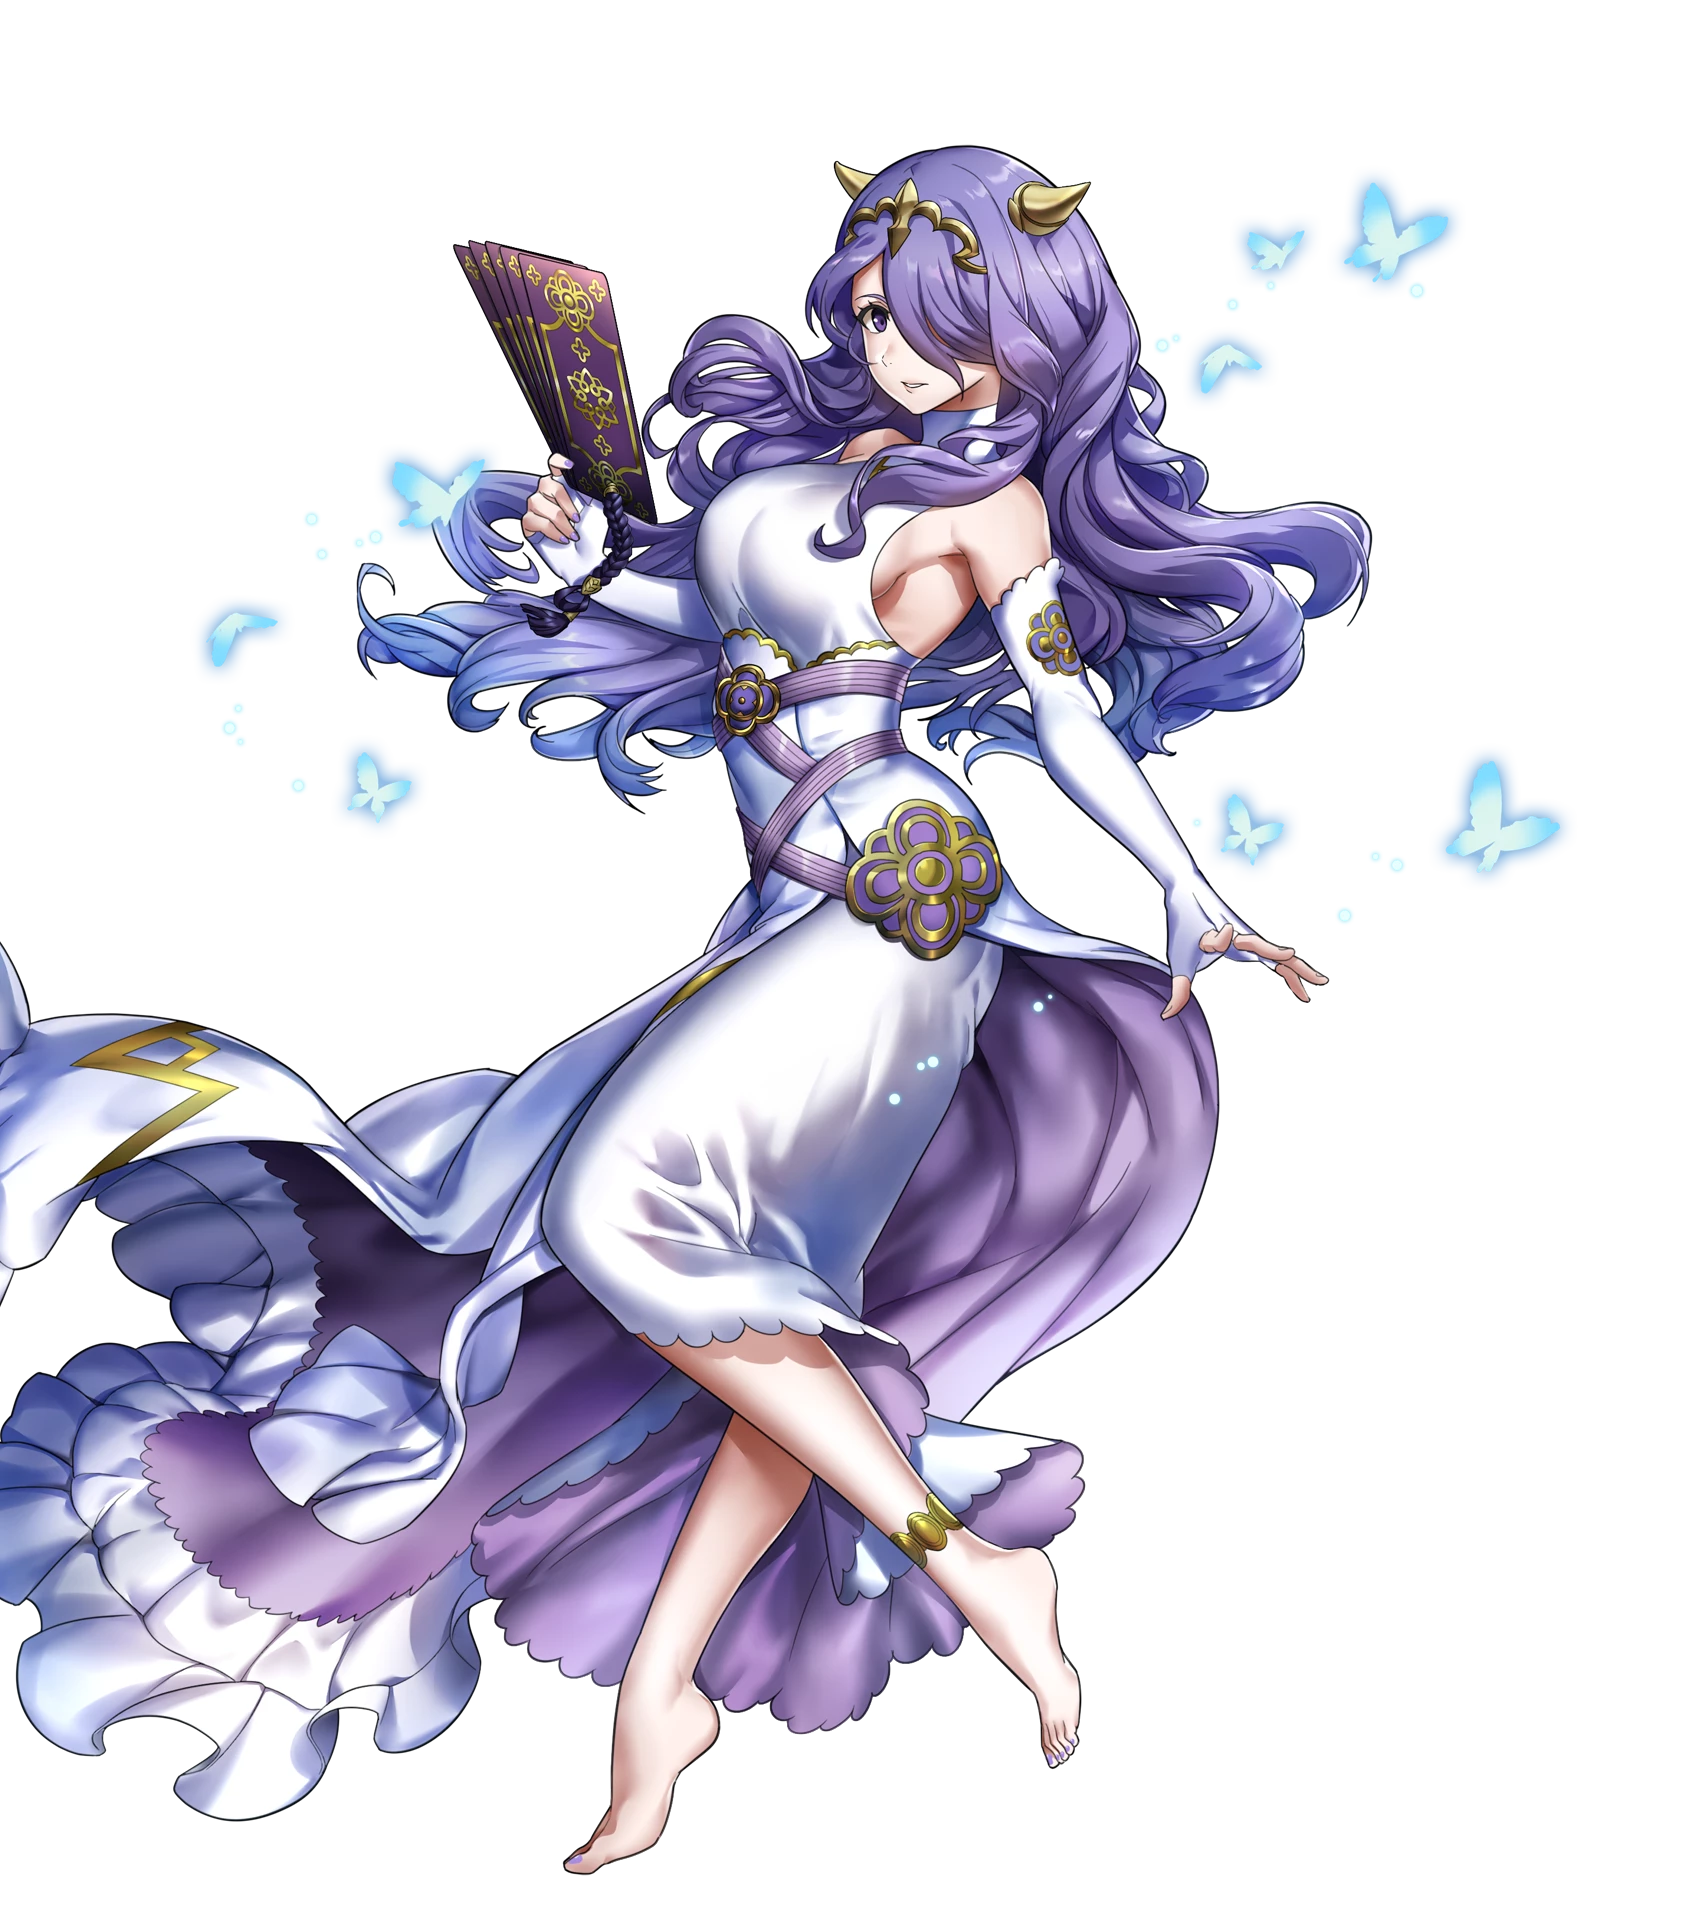 https://static.wikia.nocookie.net/feheroes_gamepedia_en/images/f/fe/Camilla_Flower_of_Fantasy_BtlFace.webp/revision/latest?cb=20190920221446&format=original